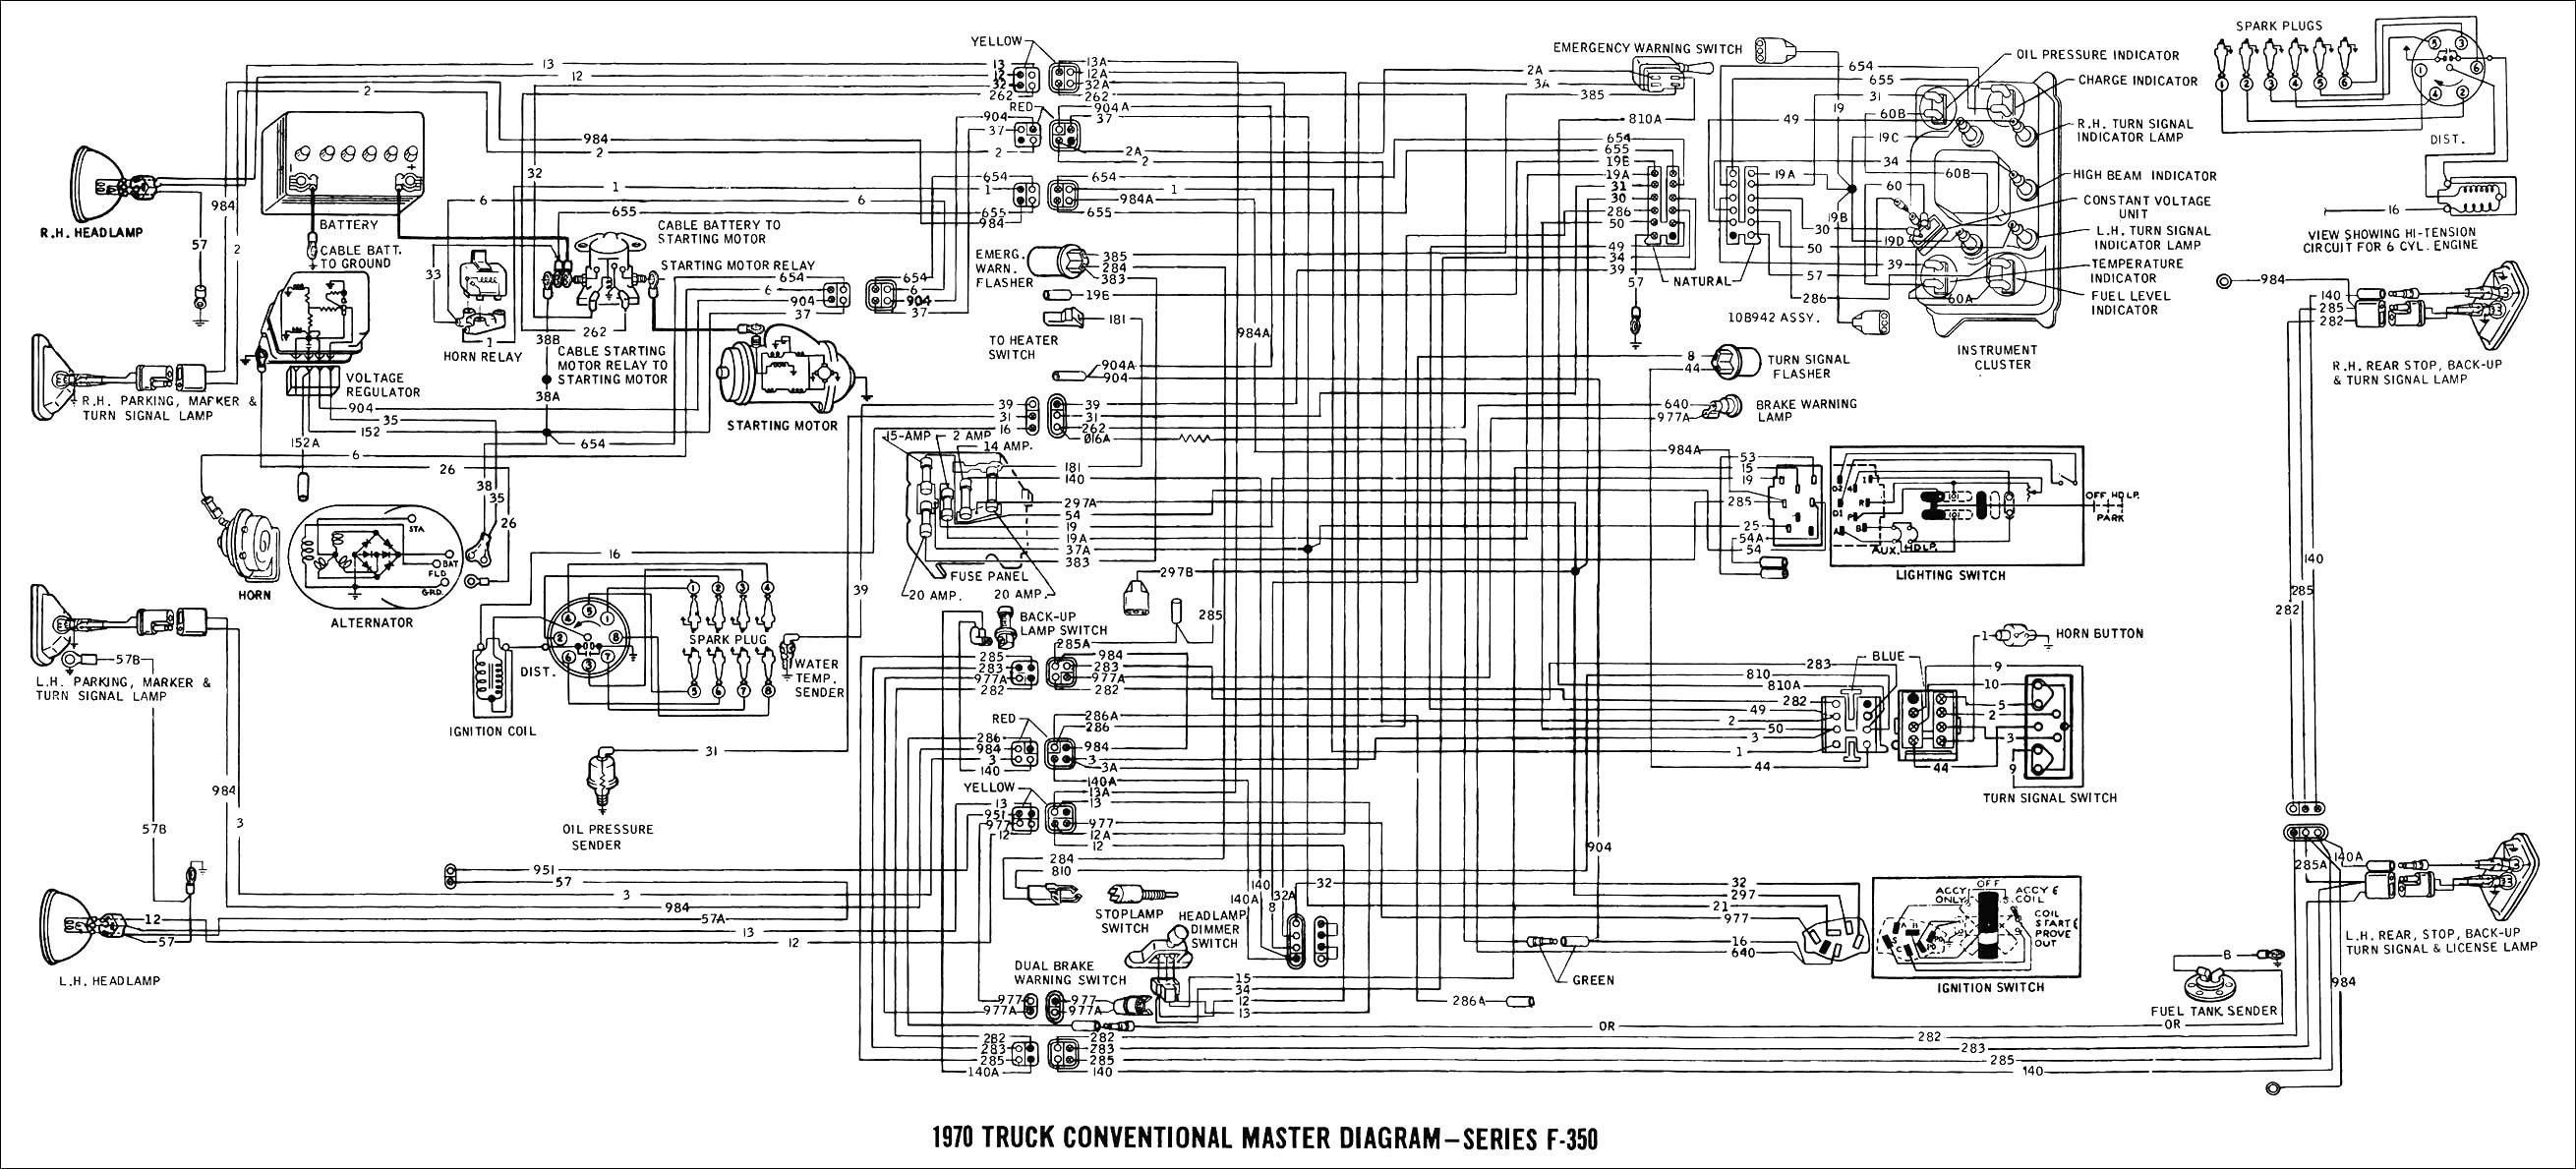 Ford 4 6 Engine Diagram 2 Wrg 5047] 2003 ford 4 6l Engine Diagram Of Ford 4 6 Engine Diagram 2